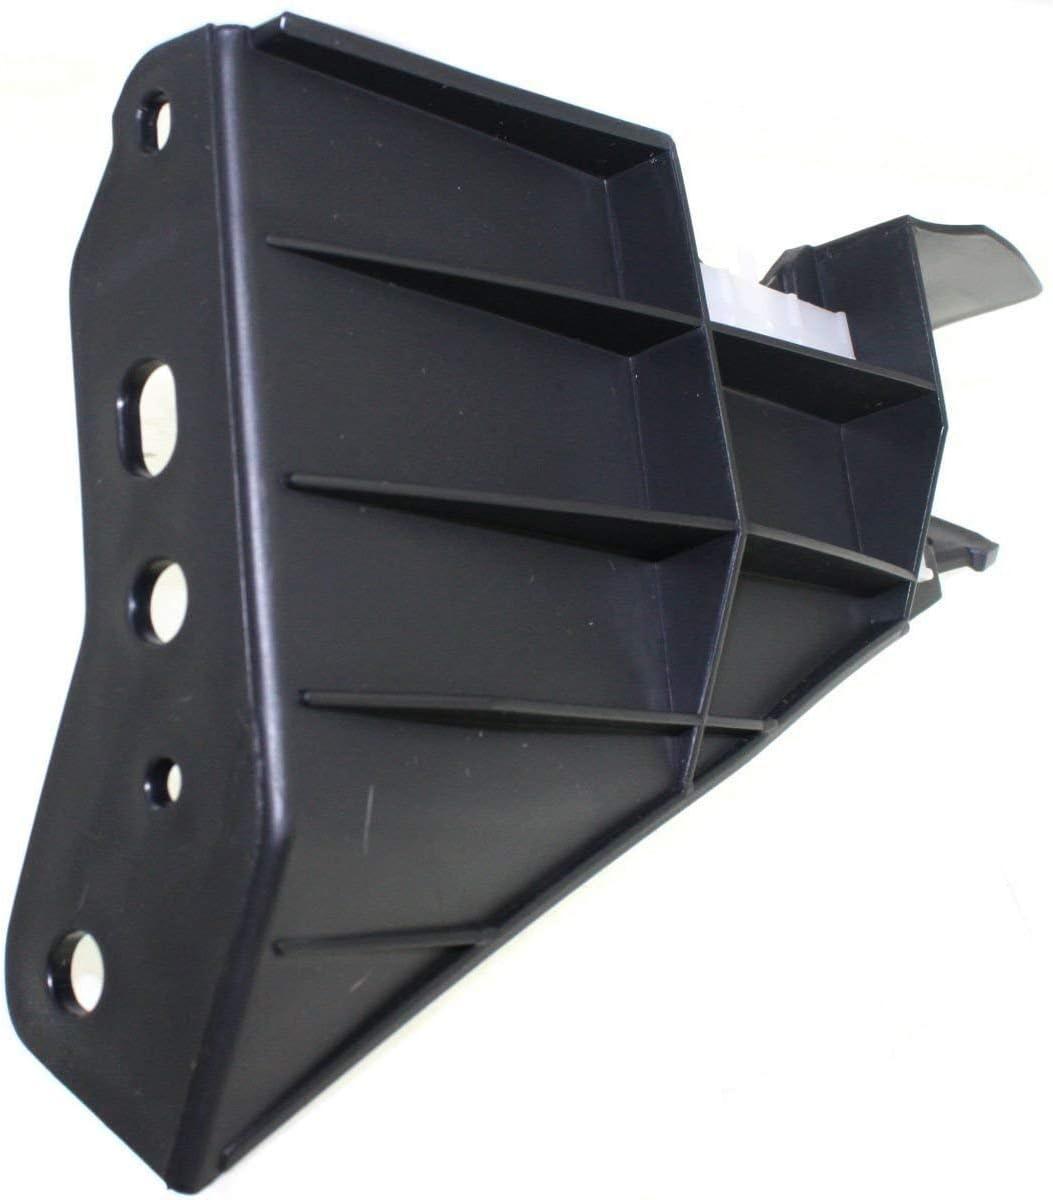 FORD MUSTANG 05-09 FRONT BUMPER RH Suppor price Reinforcement sale BRACKET